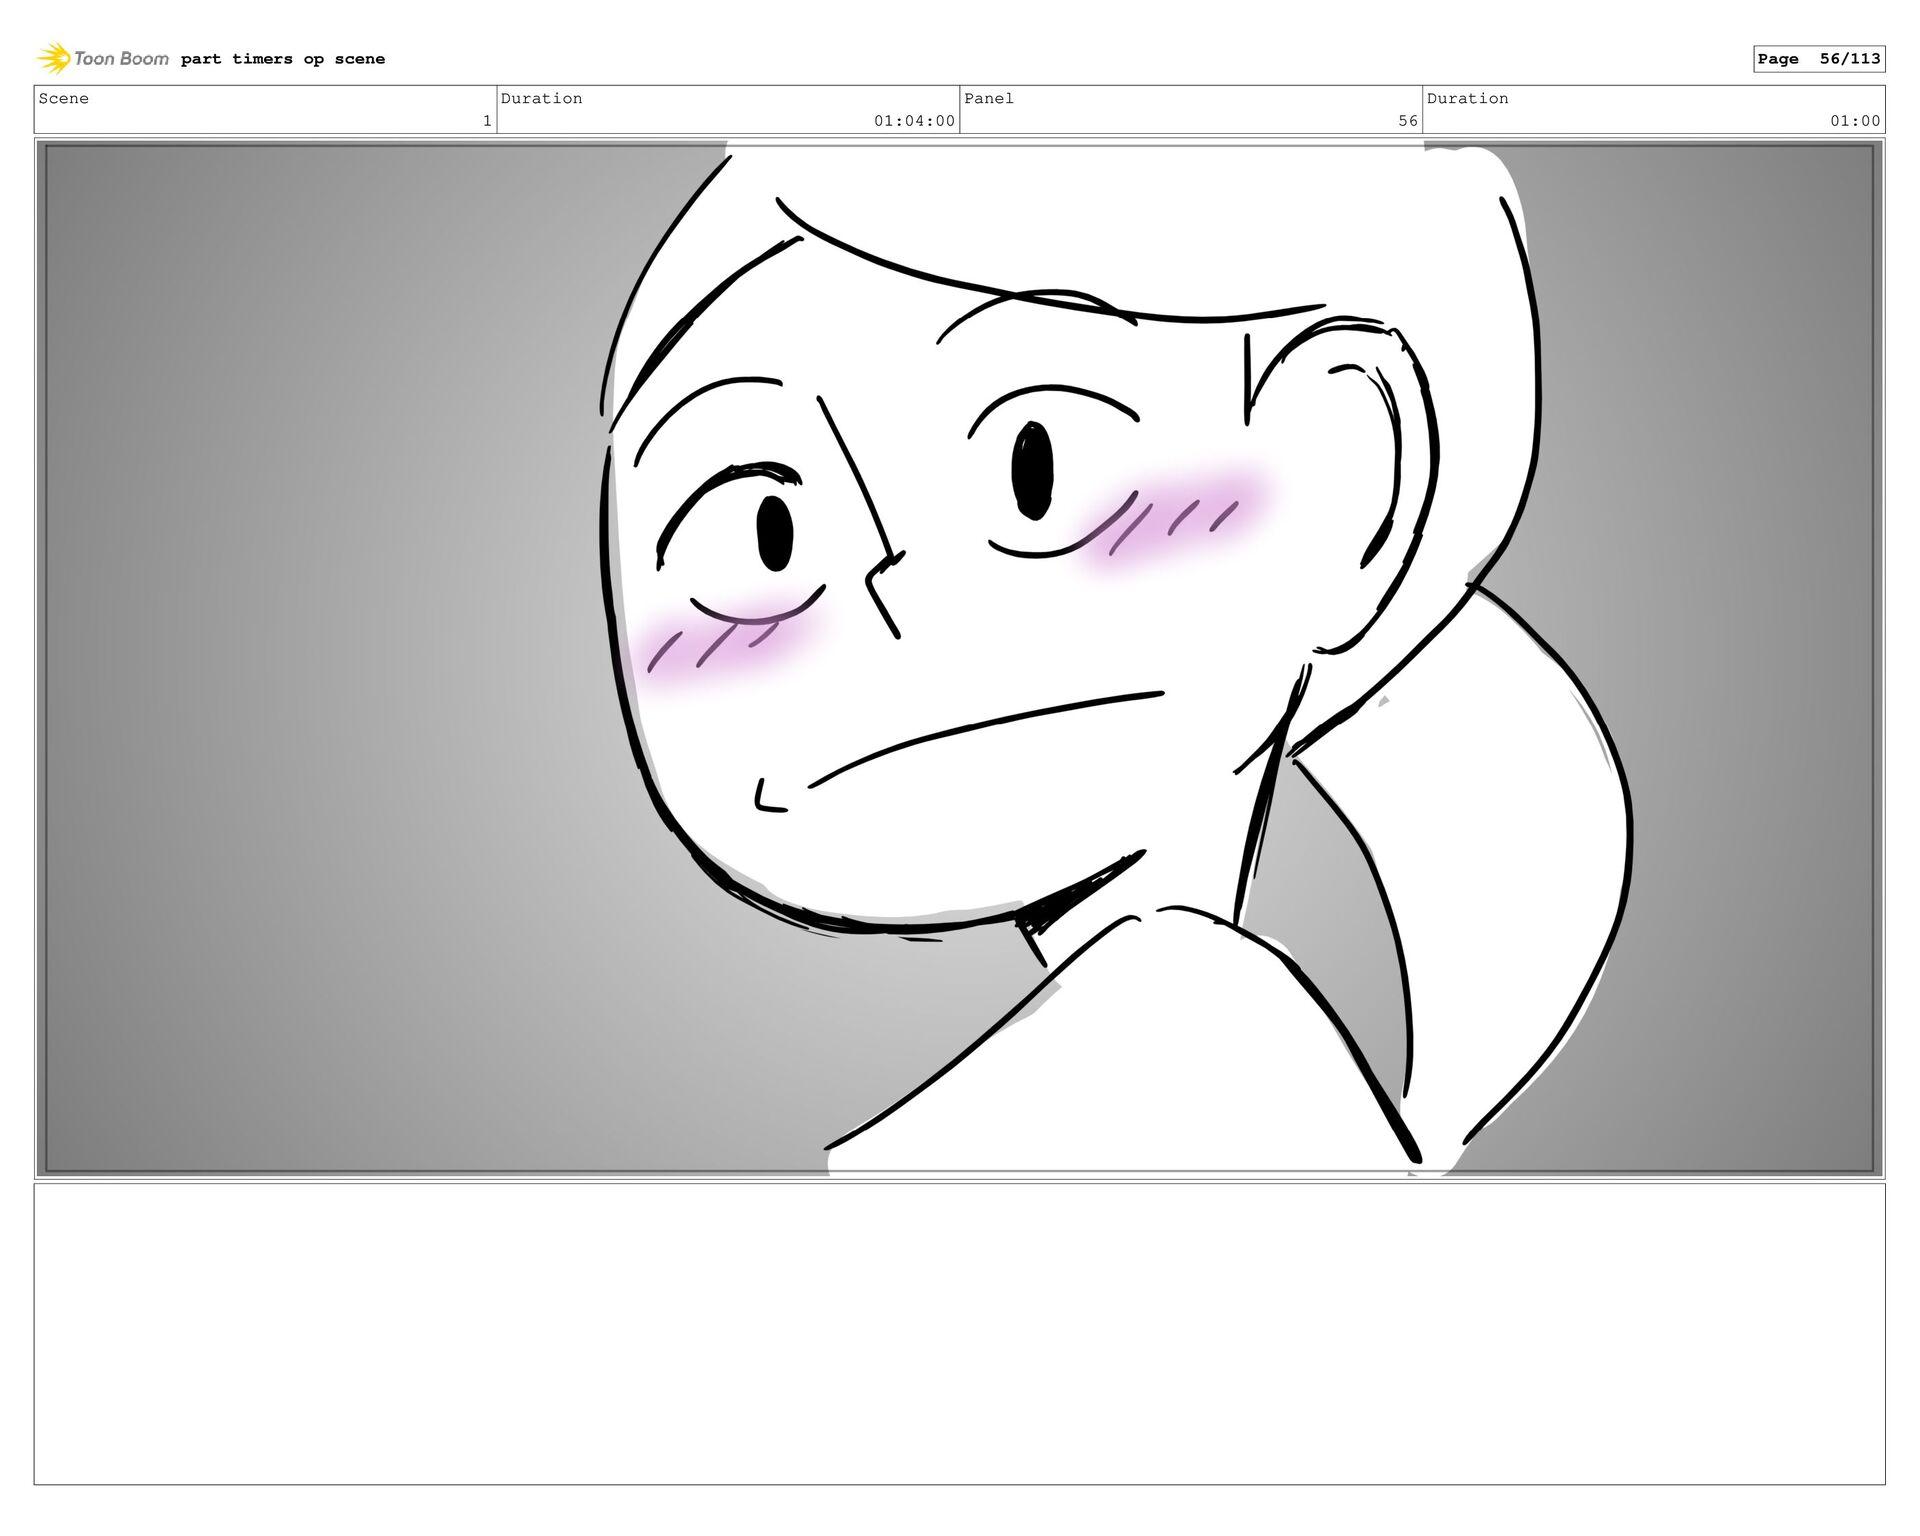 Scene 3 Duration 44:00 Panel 24 Duration 01:00 ...